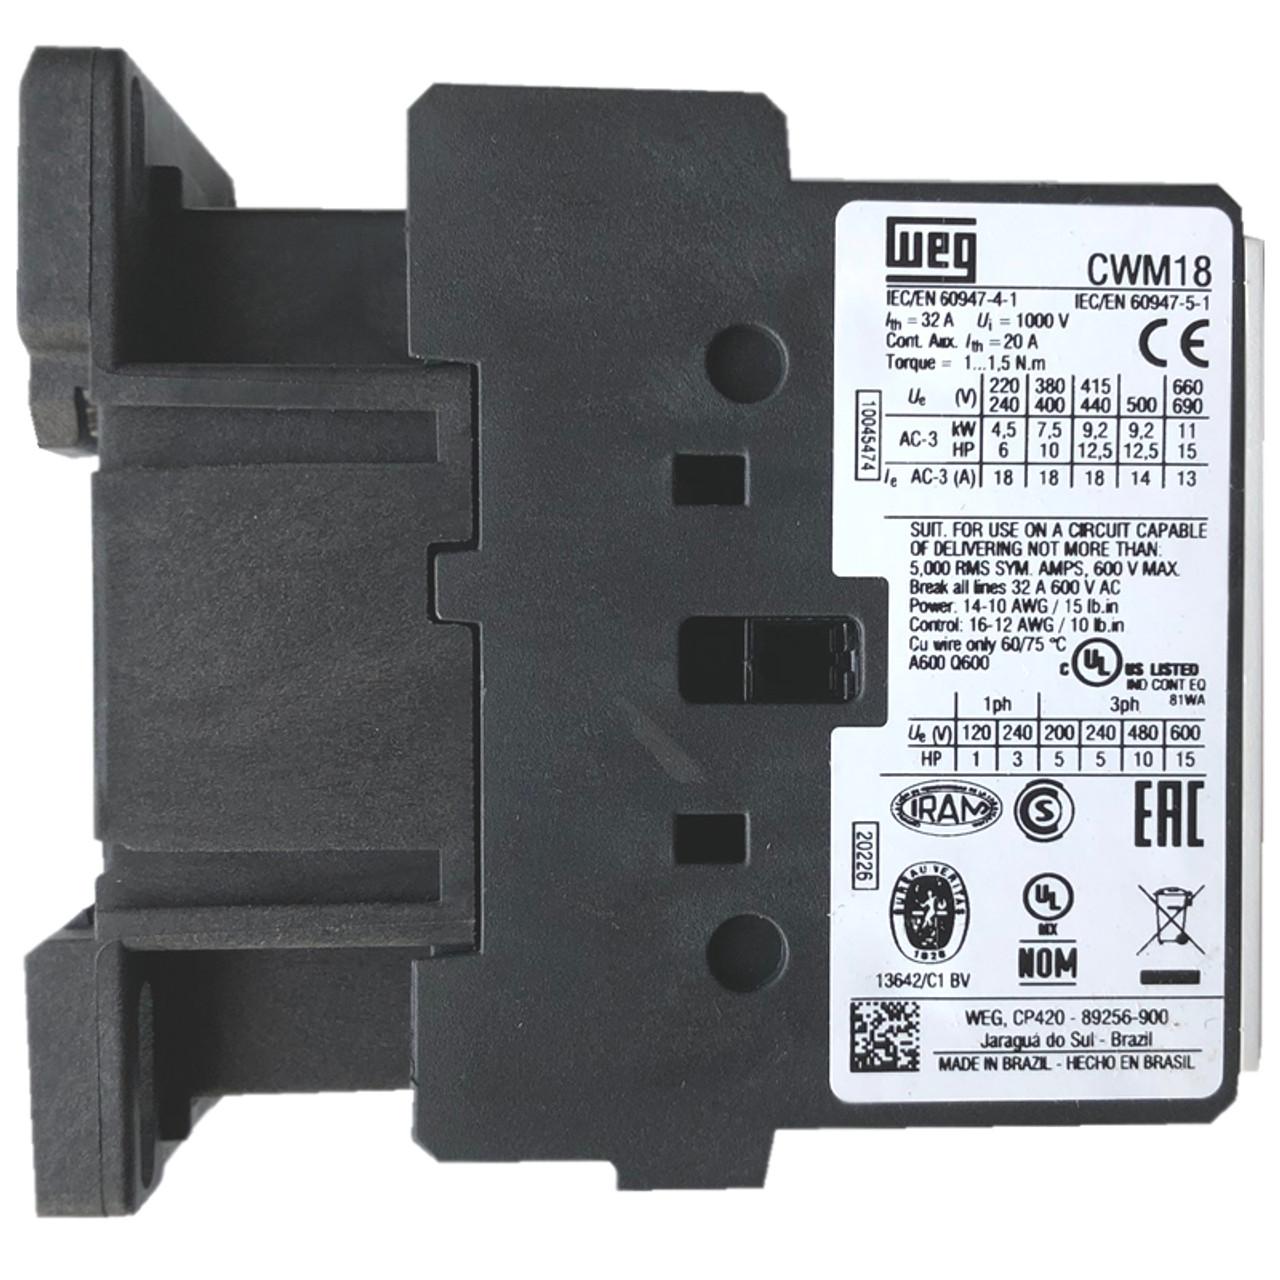 WEG CWM18-10-30V10 side label